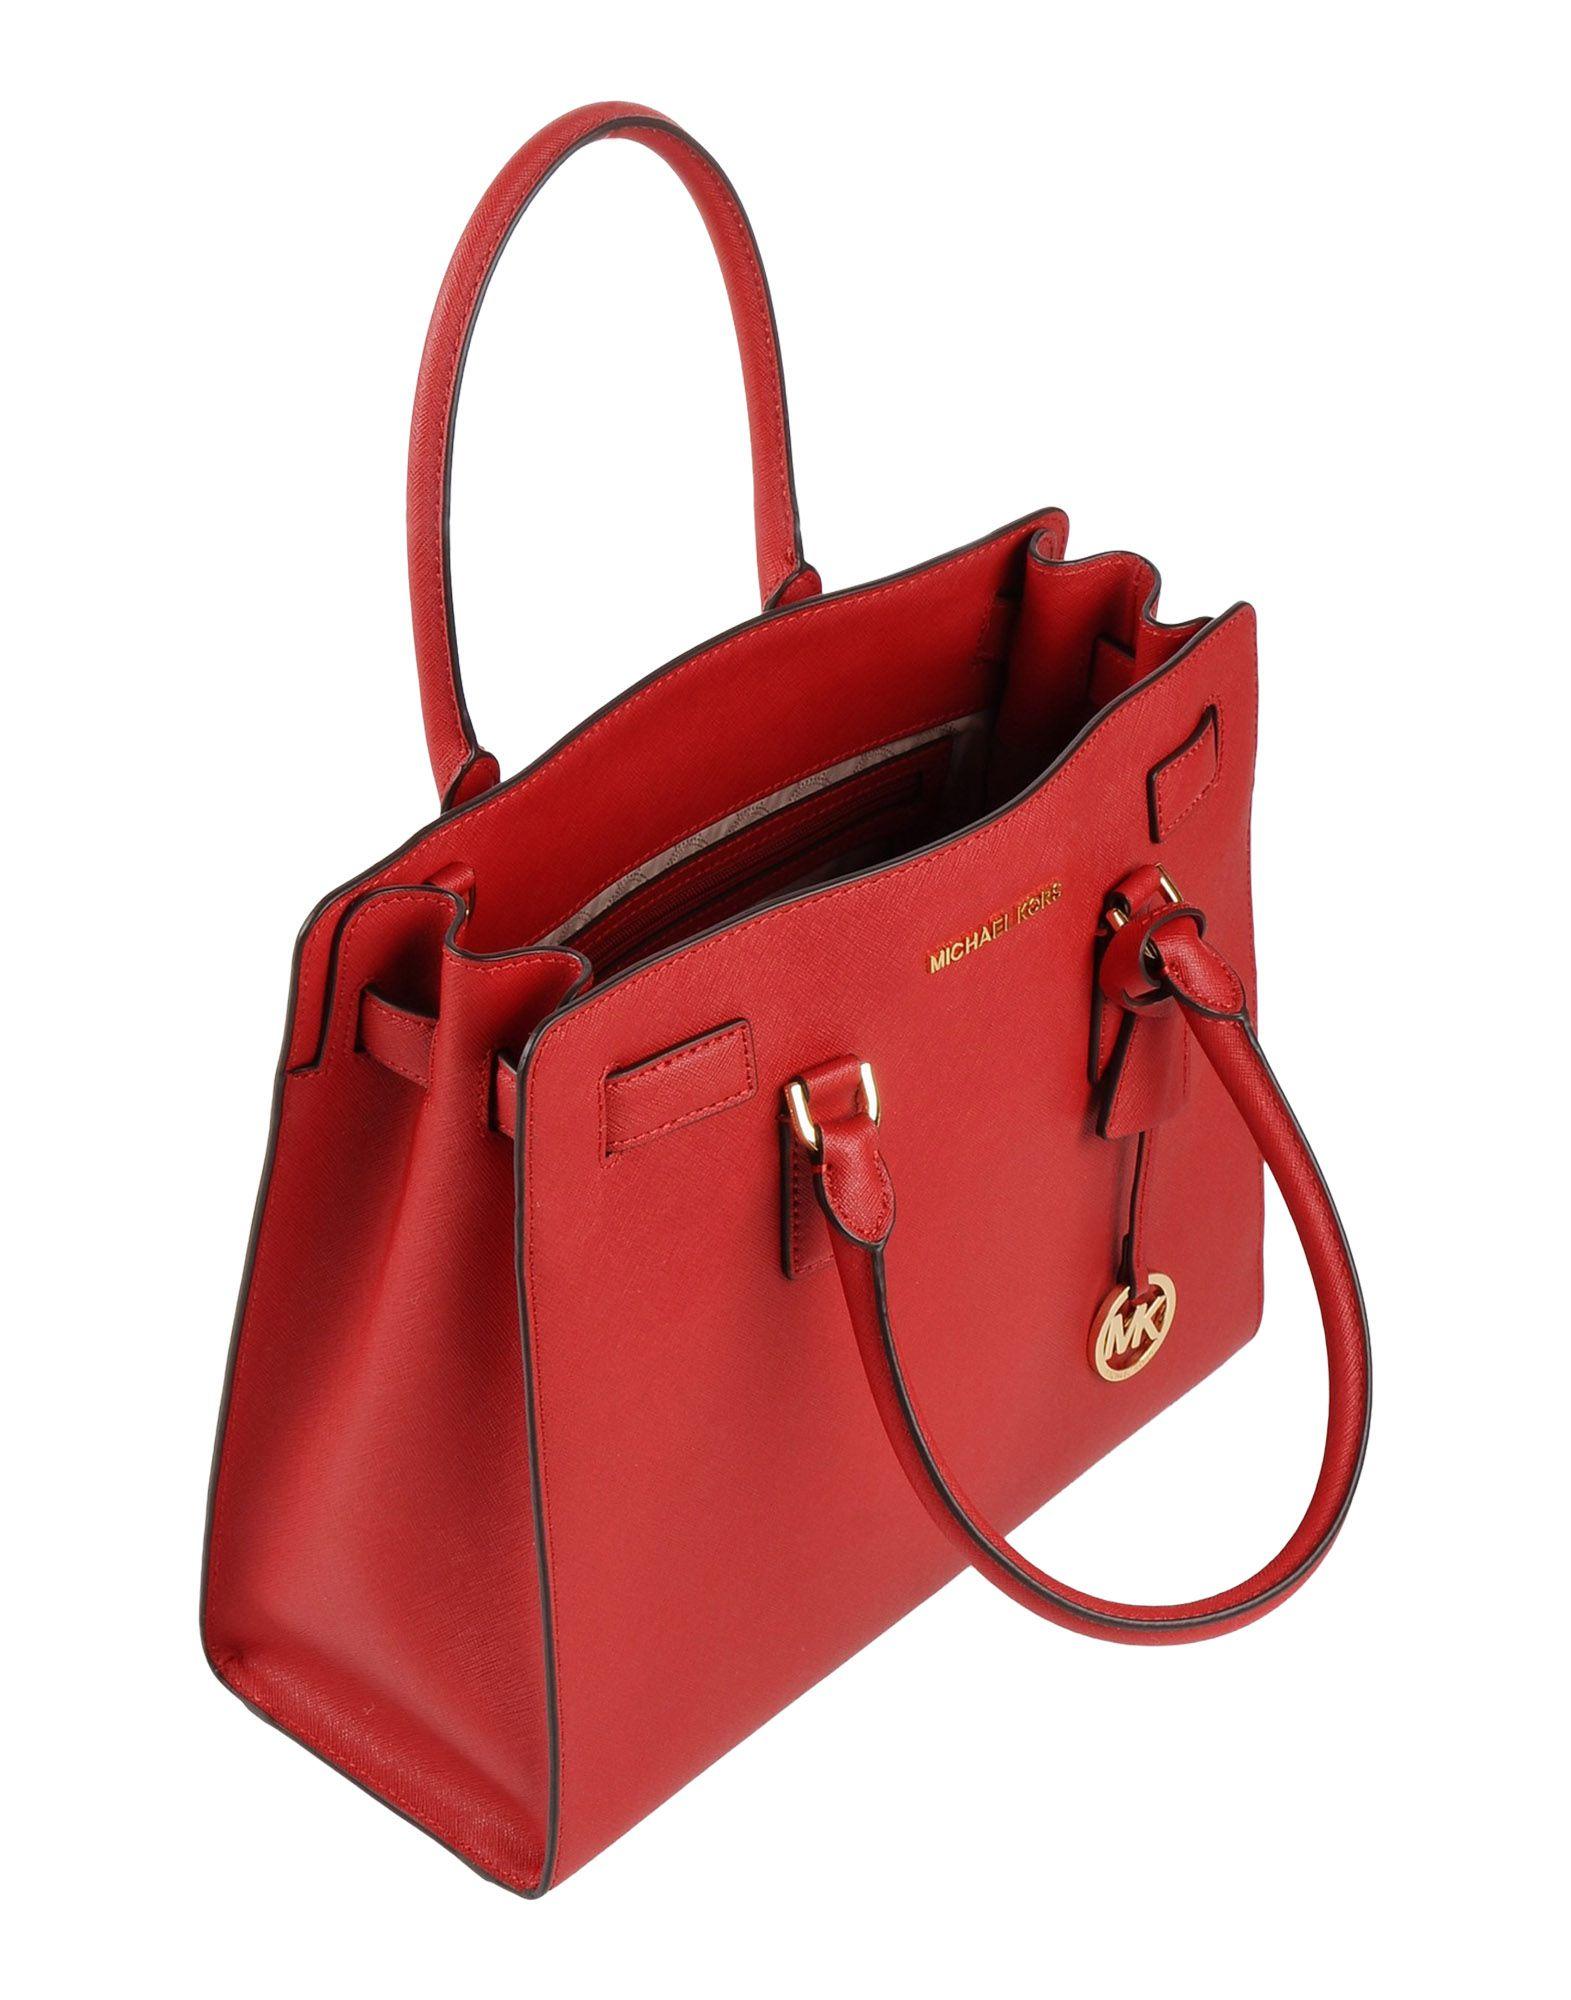 Promo Code Michael Kors Handbag In Red Lyst 15840 38b76